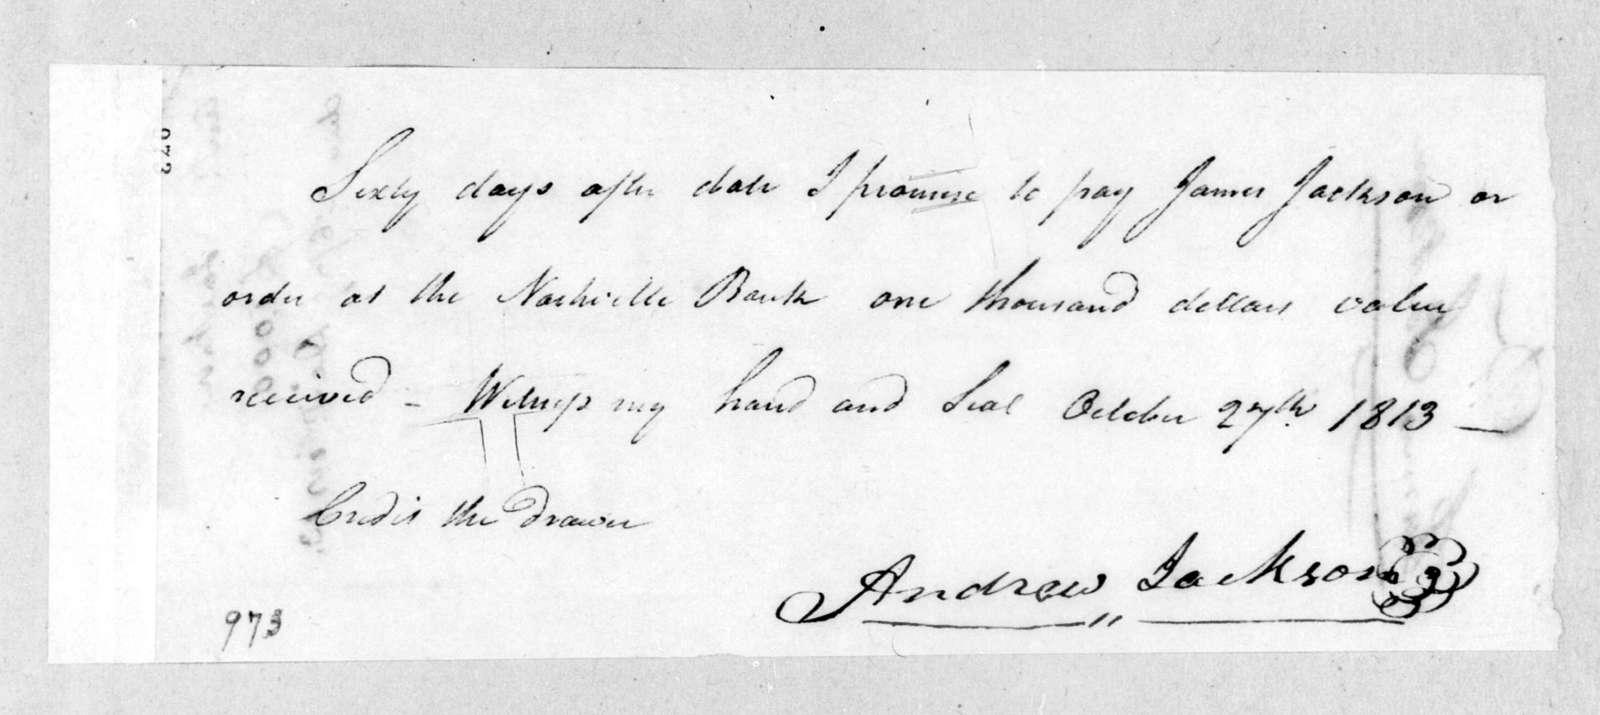 Andrew Jackson to James Jackson, October 27, 1813